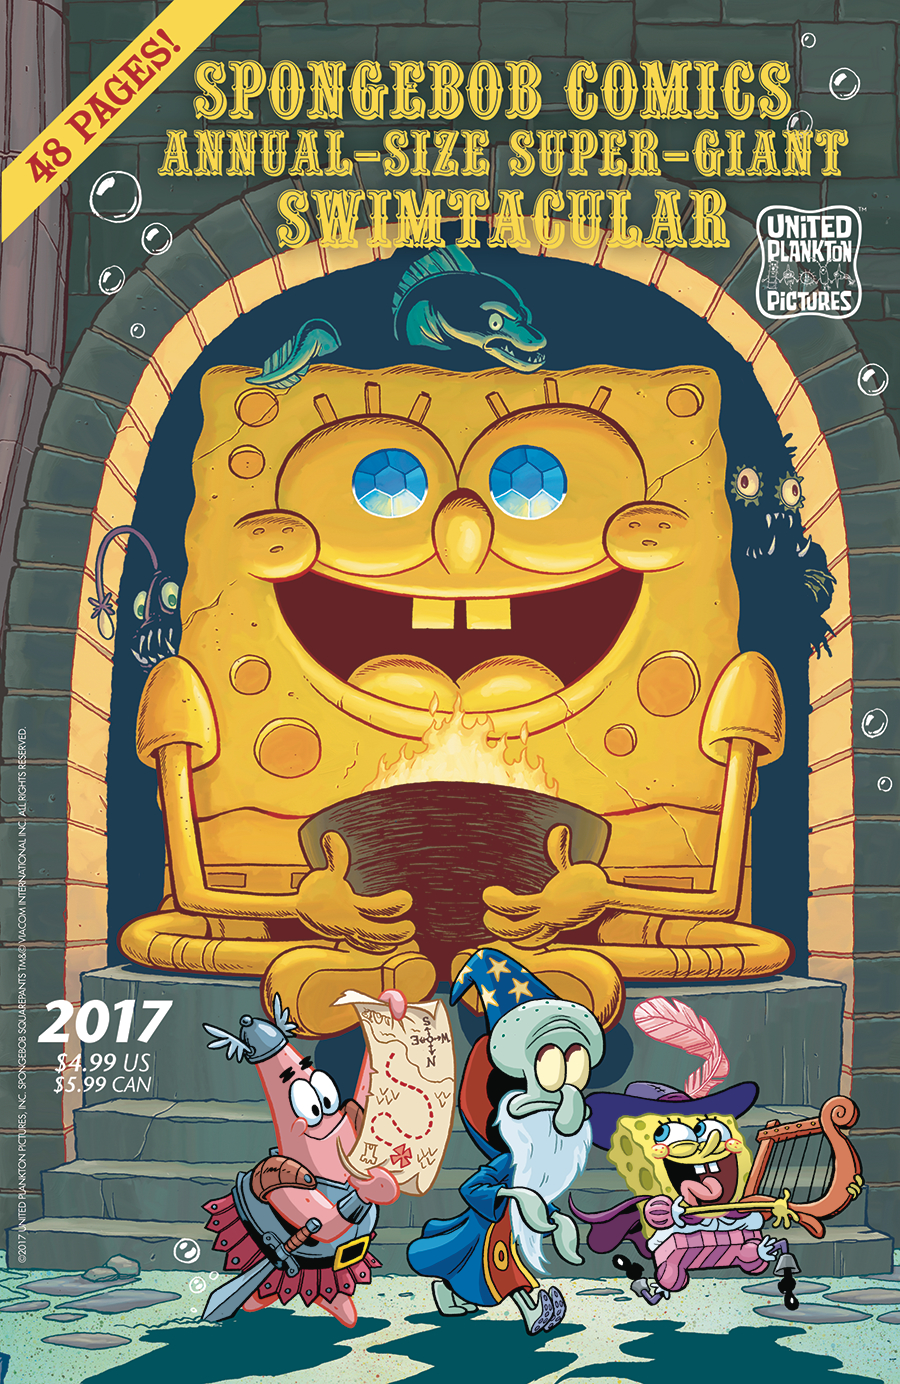 SPONGEBOB-COMICS-ANNUAL-GIANT-SWIMTACULA